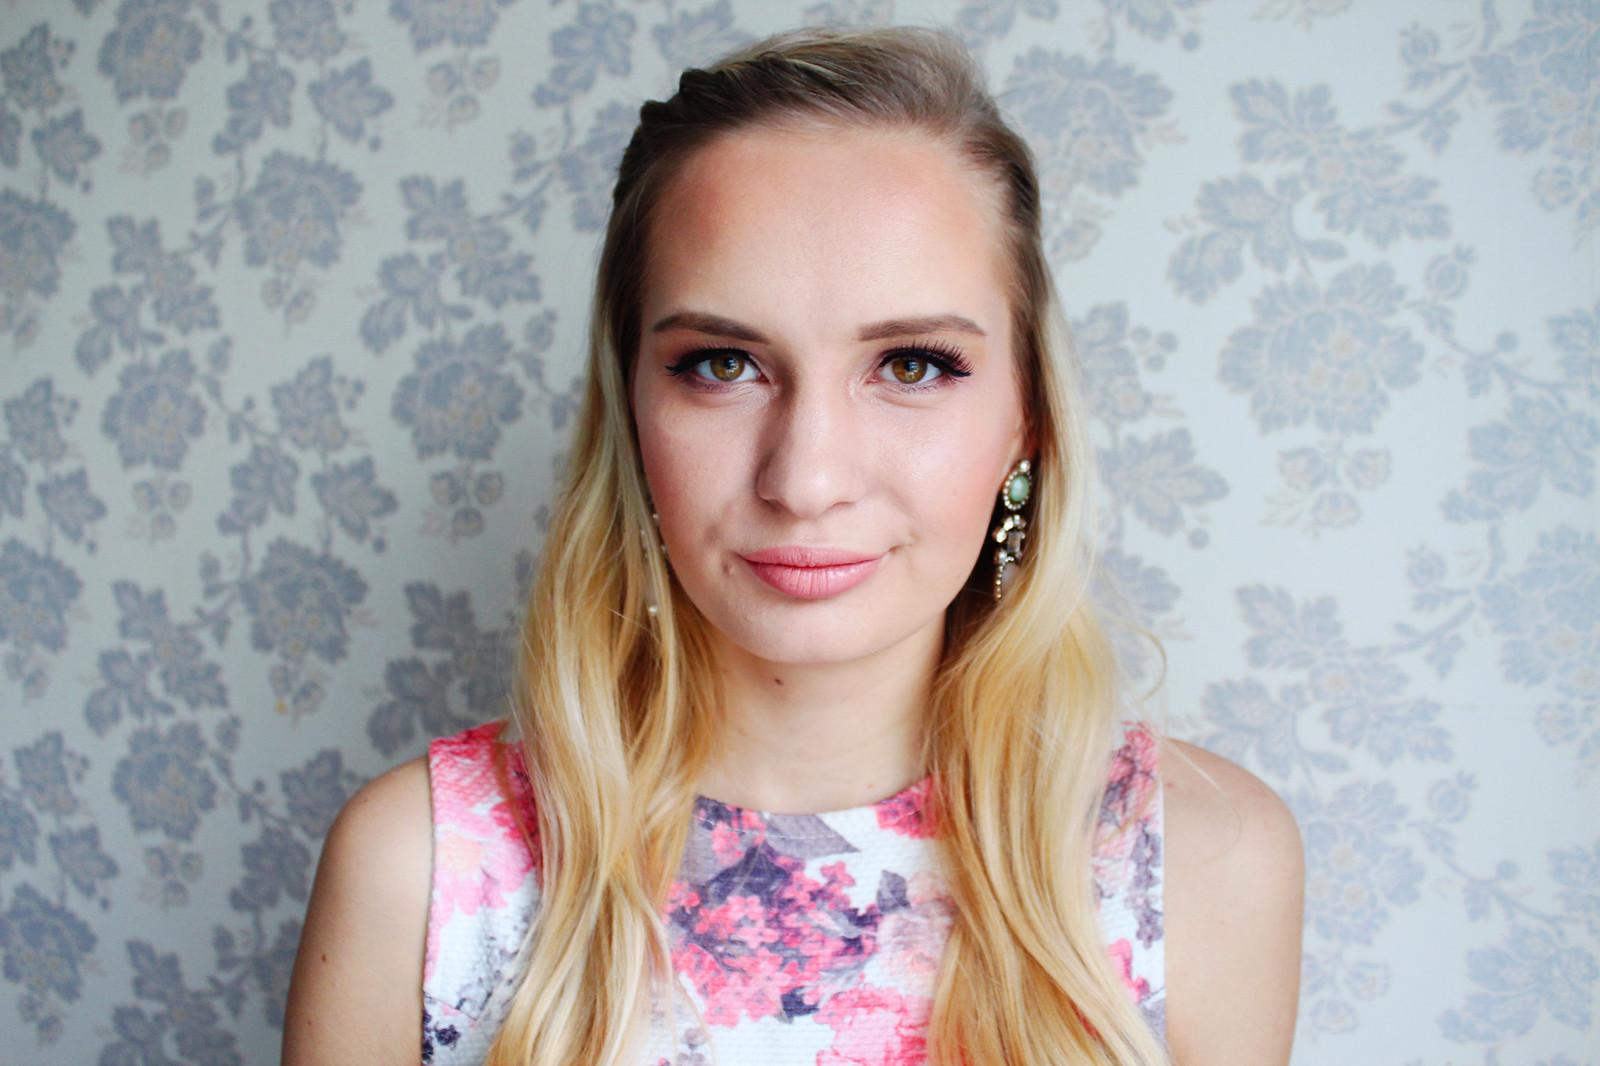 Soft and feminine makeup